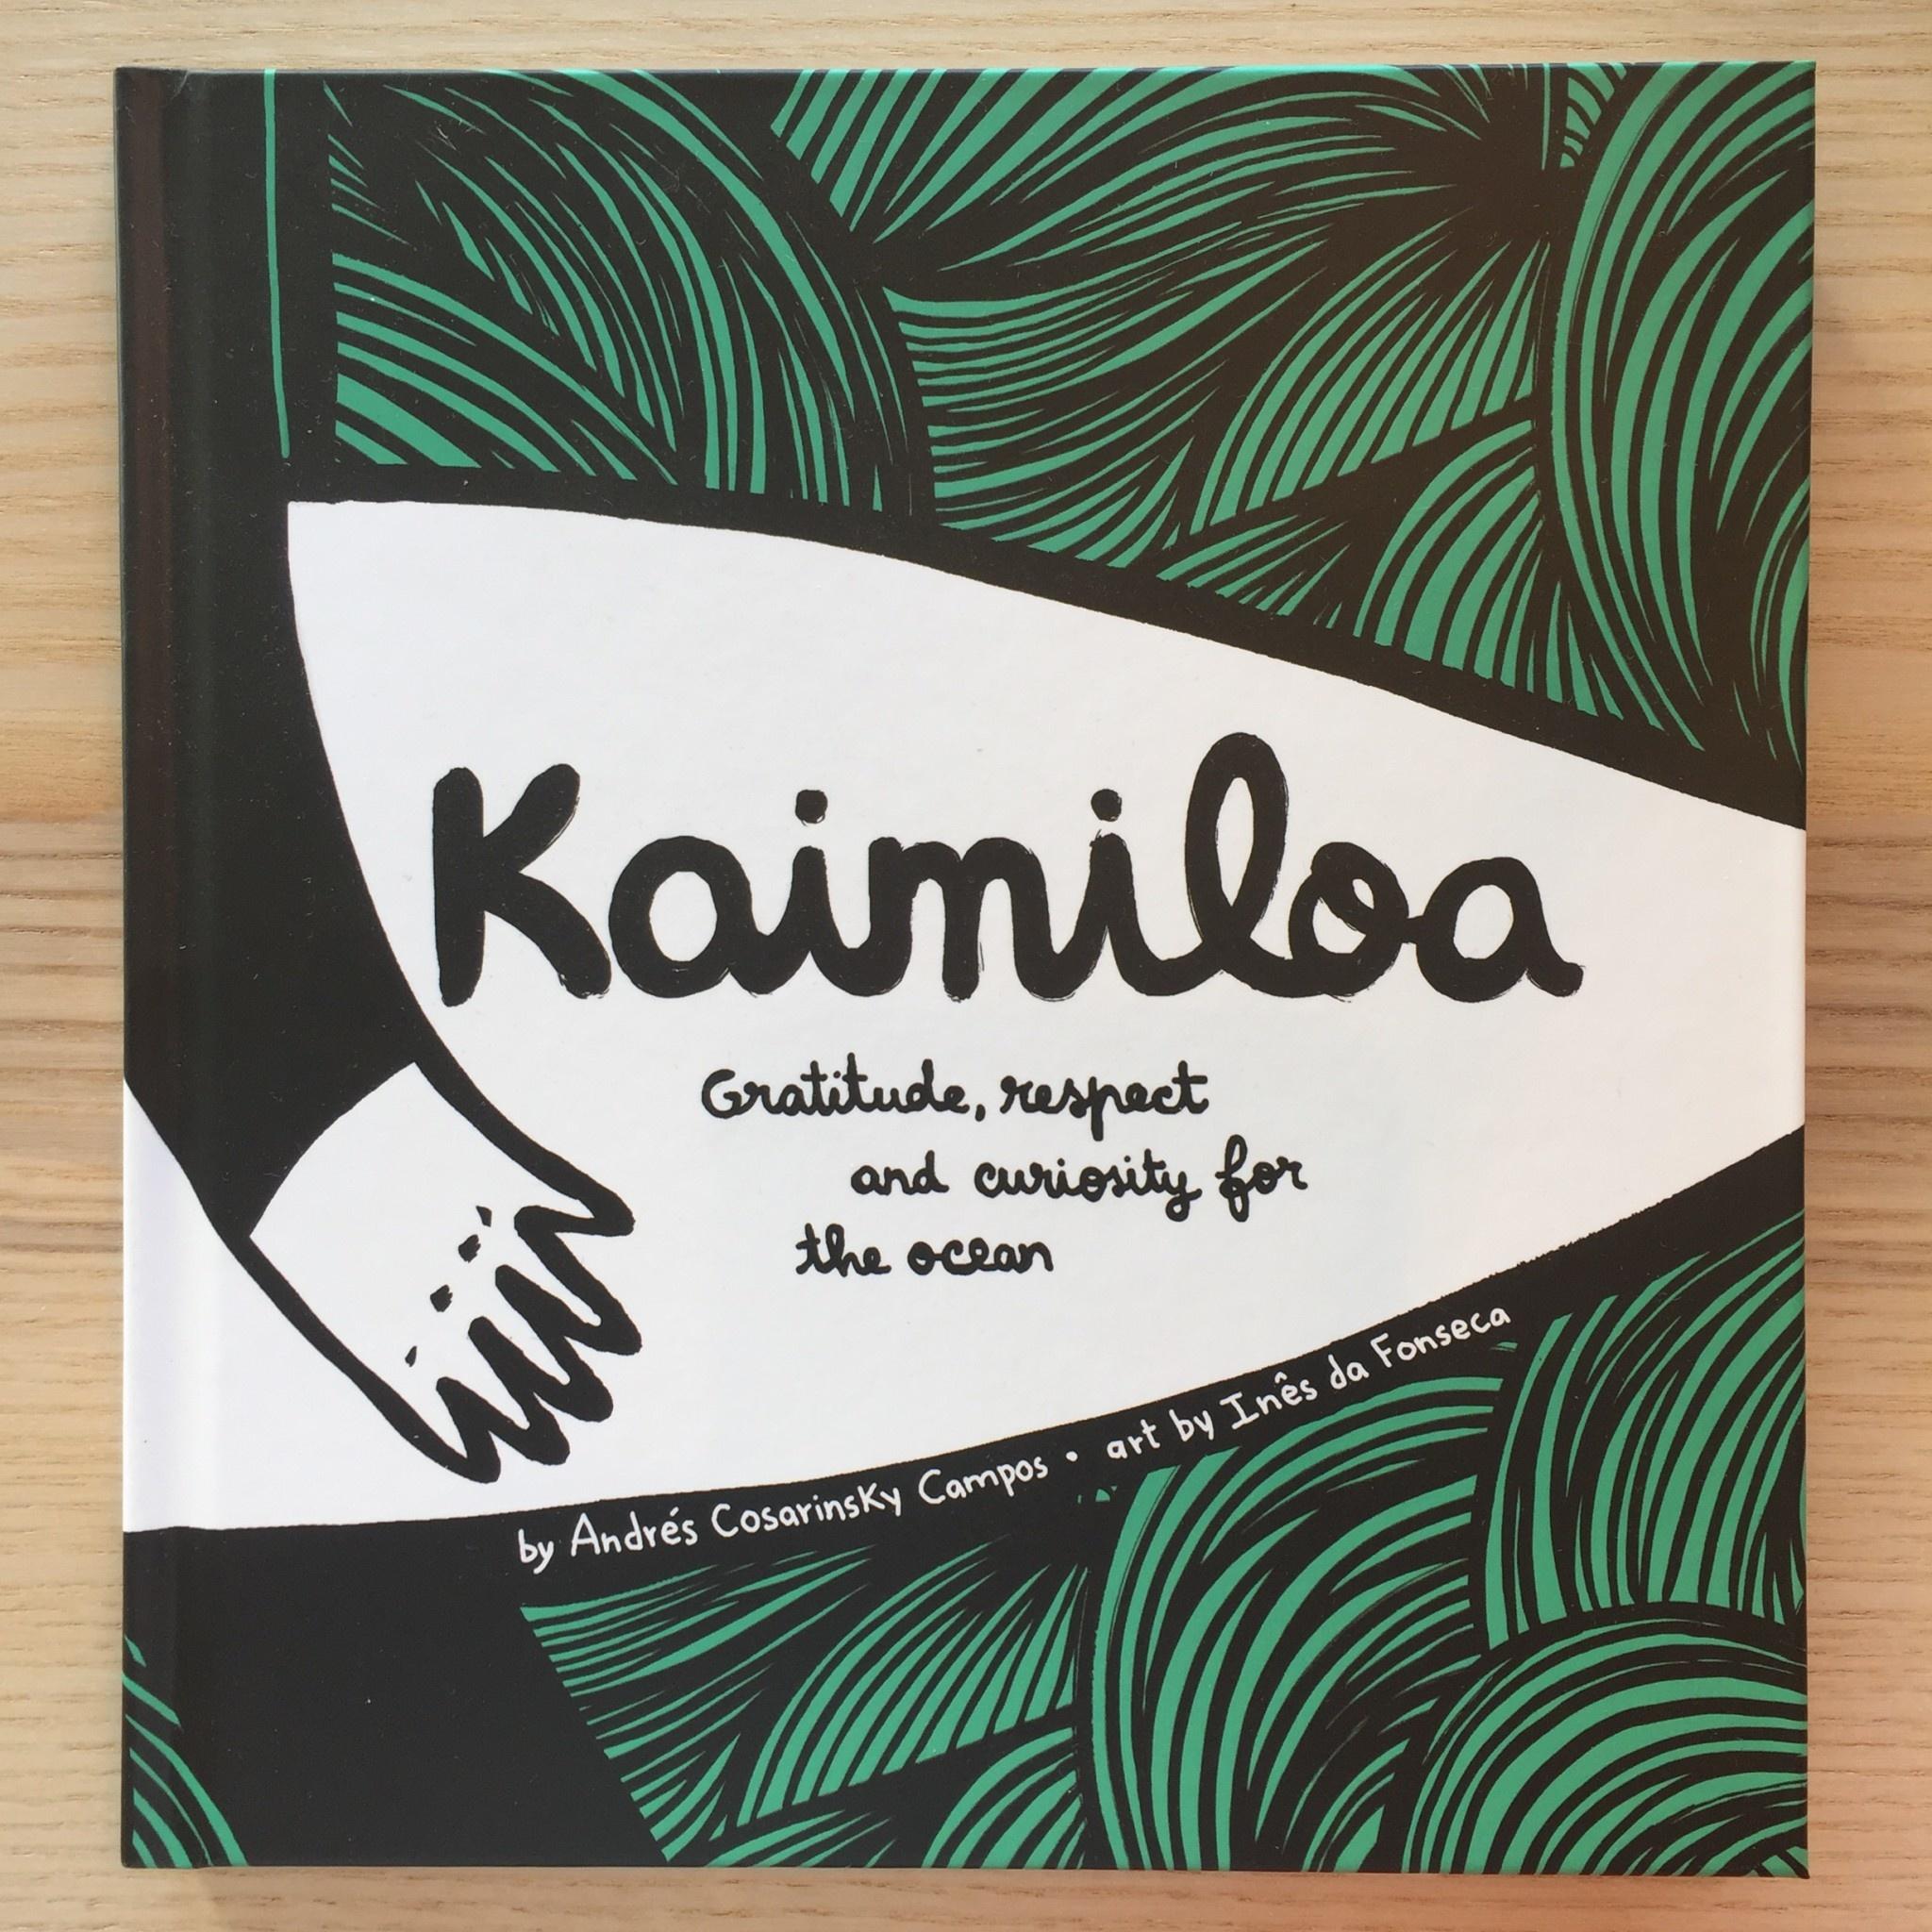 Kaimiloa kids book